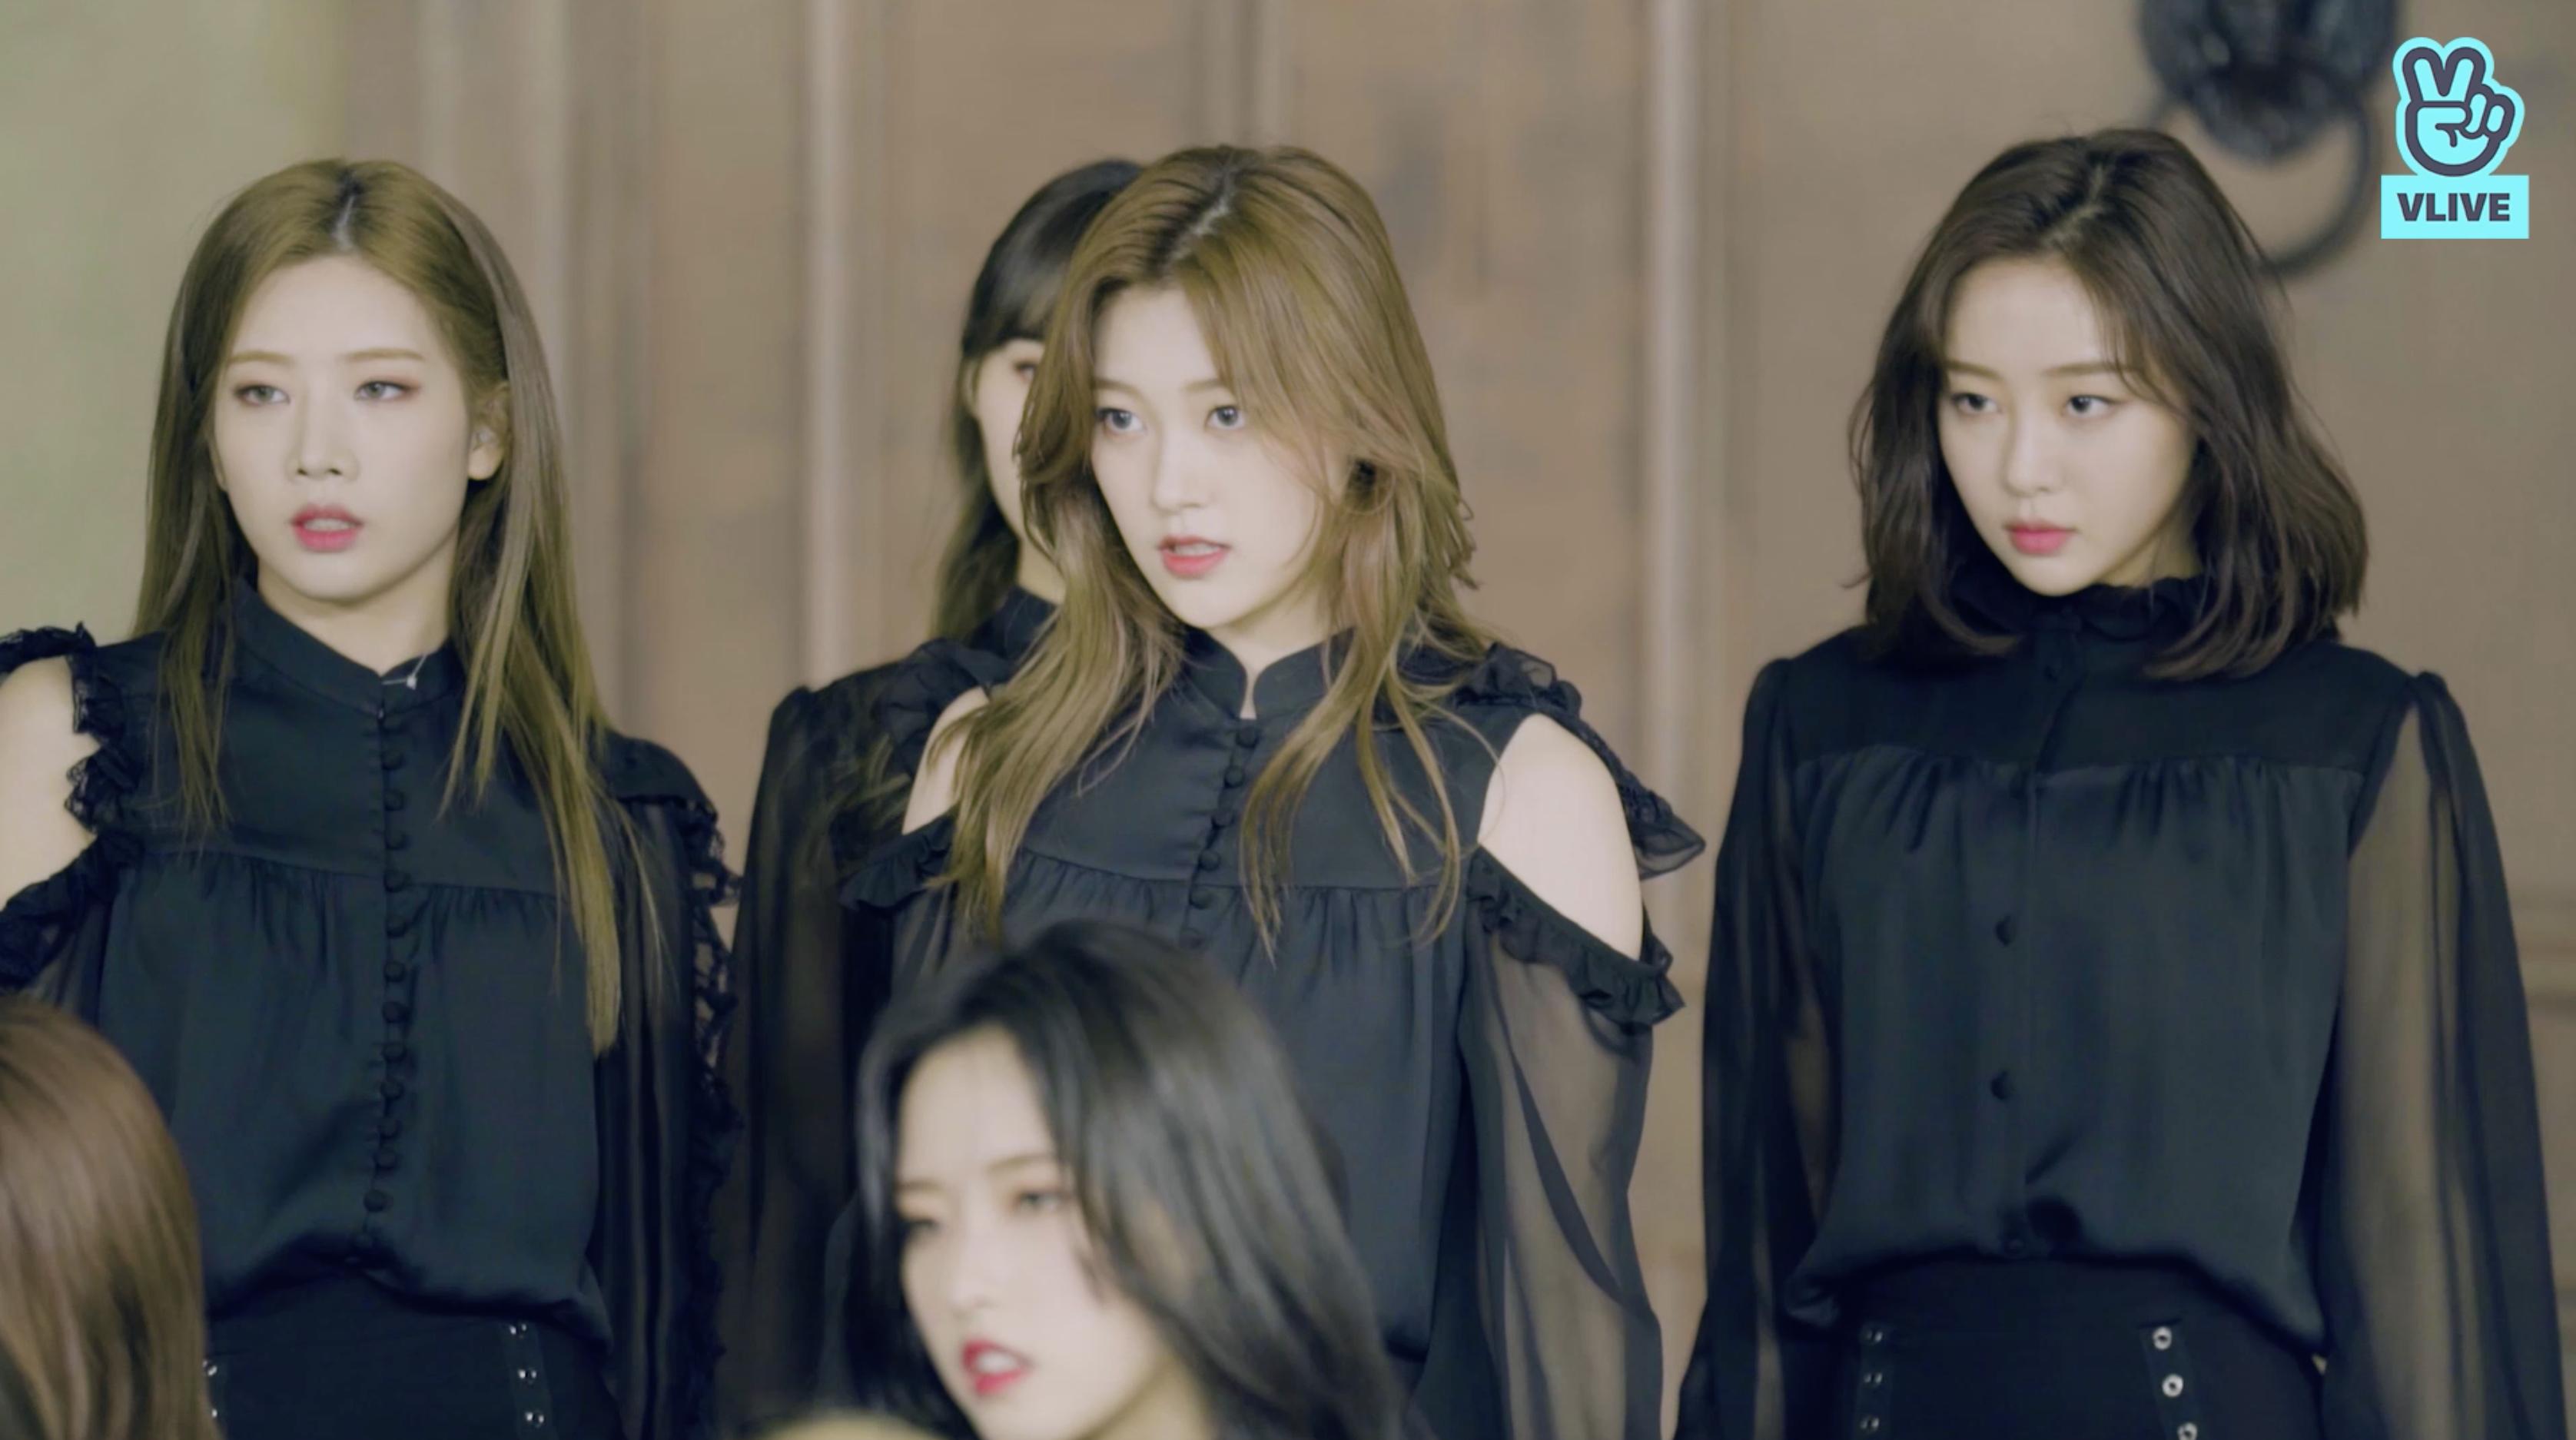 [MULTI/VERSE_BEHIND] 이달의 소녀(LOONA) 'Butterfly' 편 (feat. 흥달소 노래방🎤)